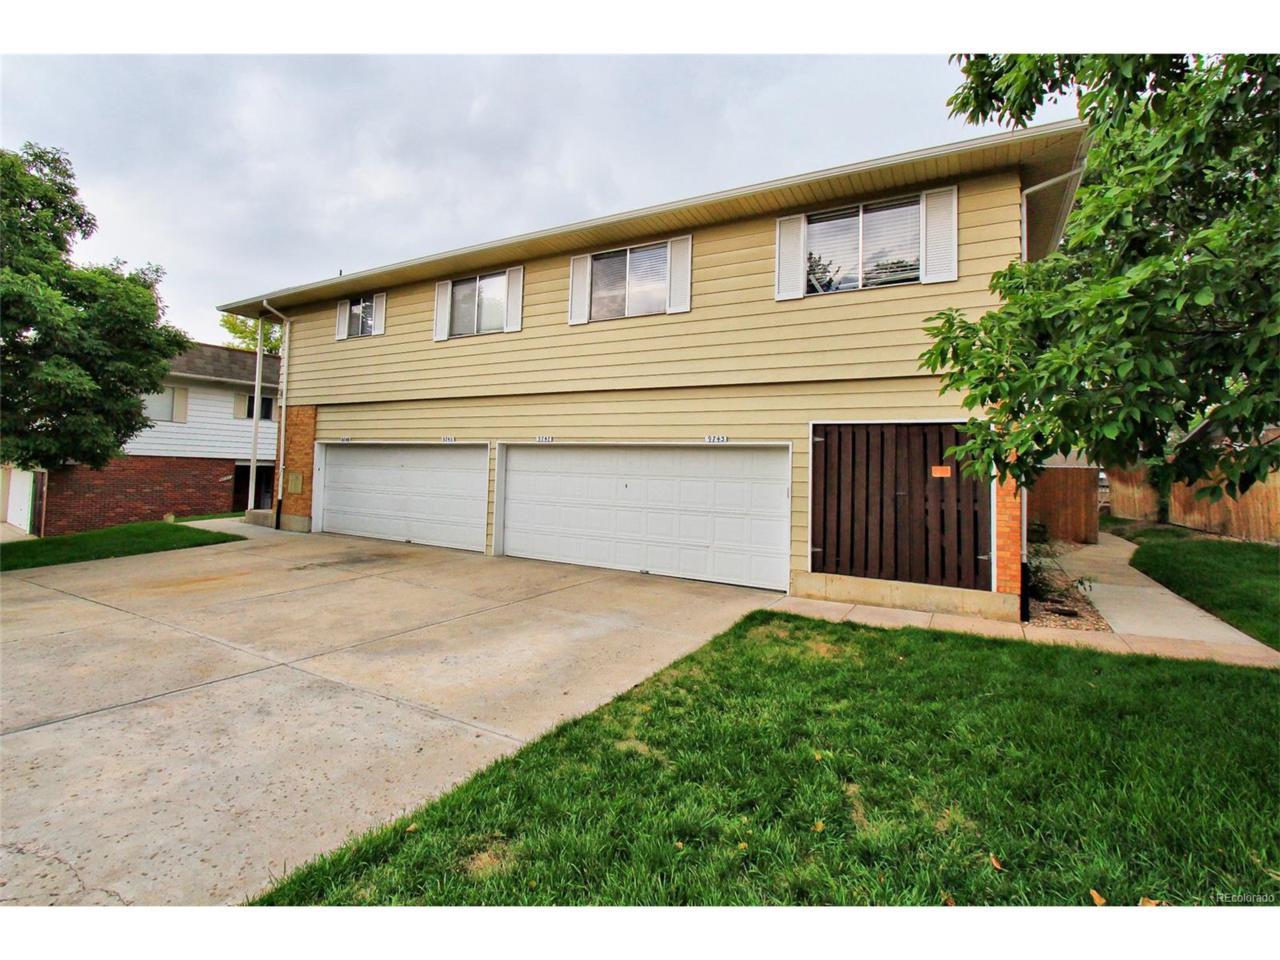 9747 Croke Drive, Thornton, CO 80260 (MLS #4132758) :: 8z Real Estate